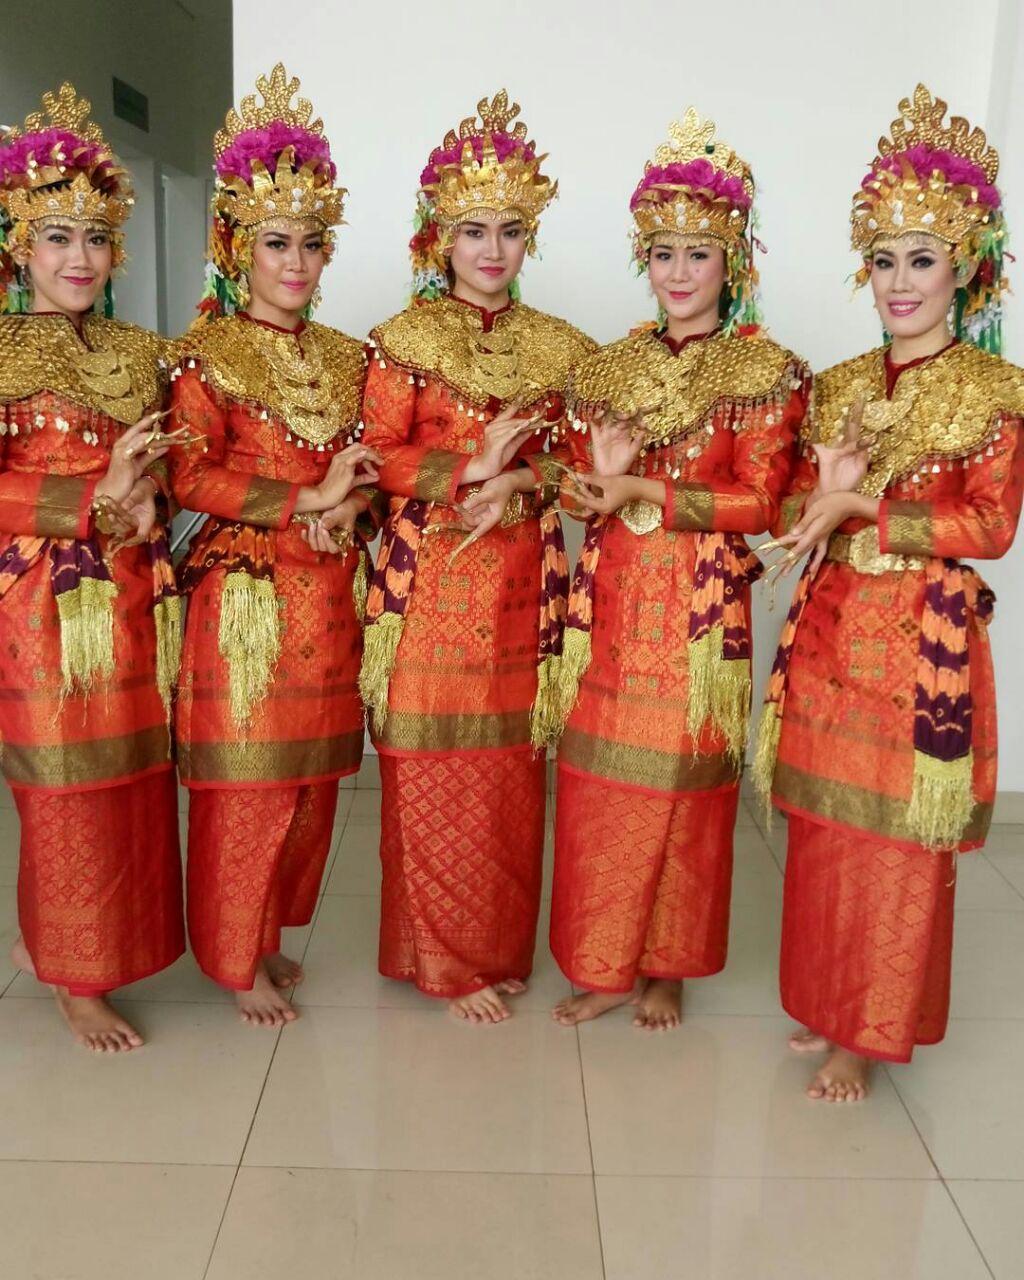 Indonesia anak sma jawa tengah beraksi - 3 part 4